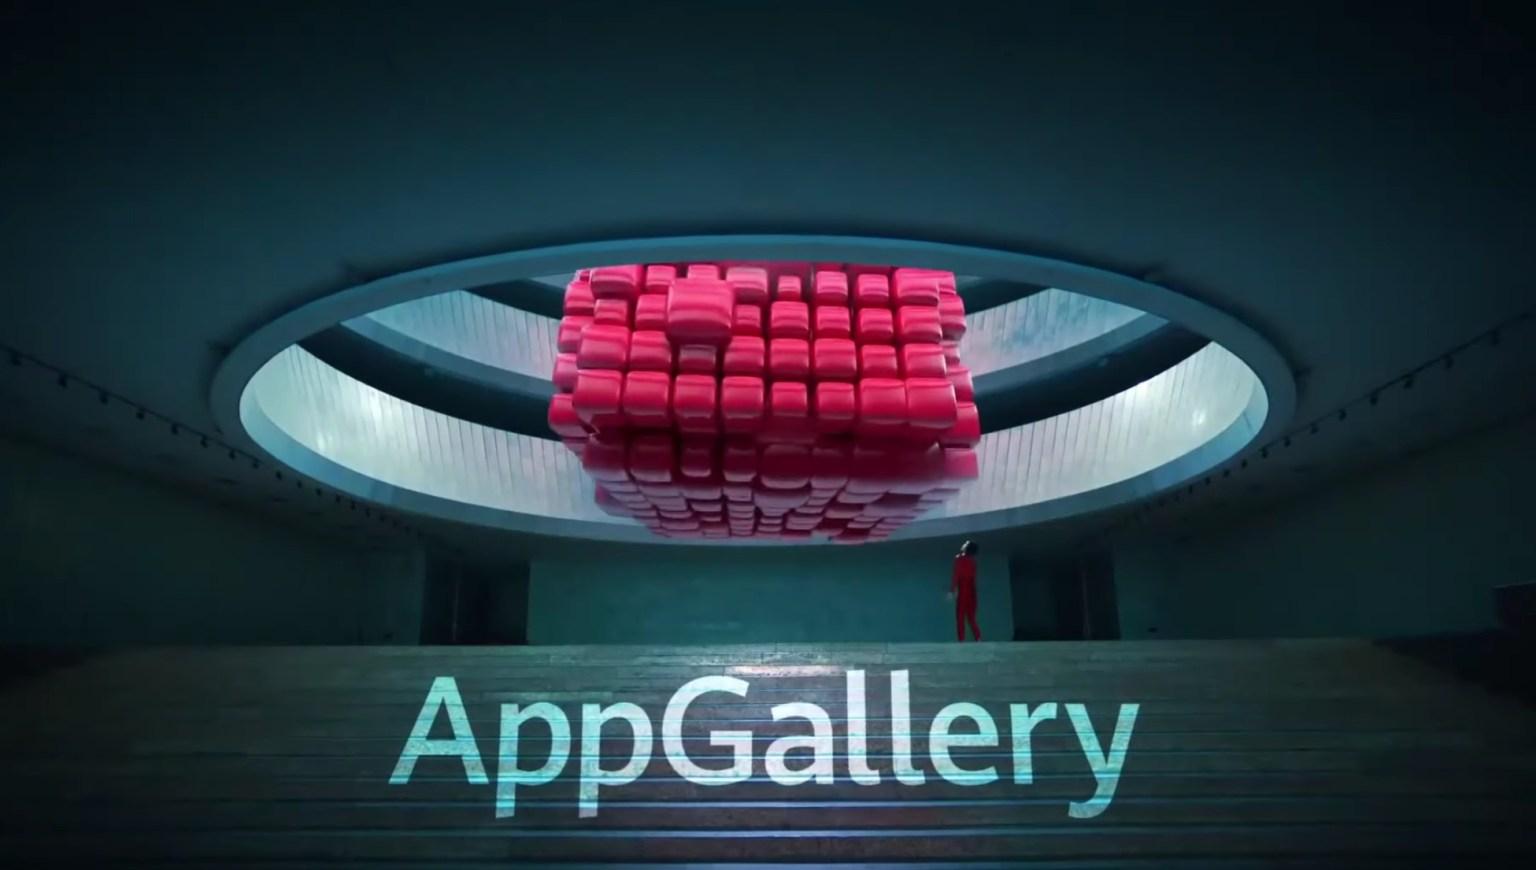 Appgallery Video Header